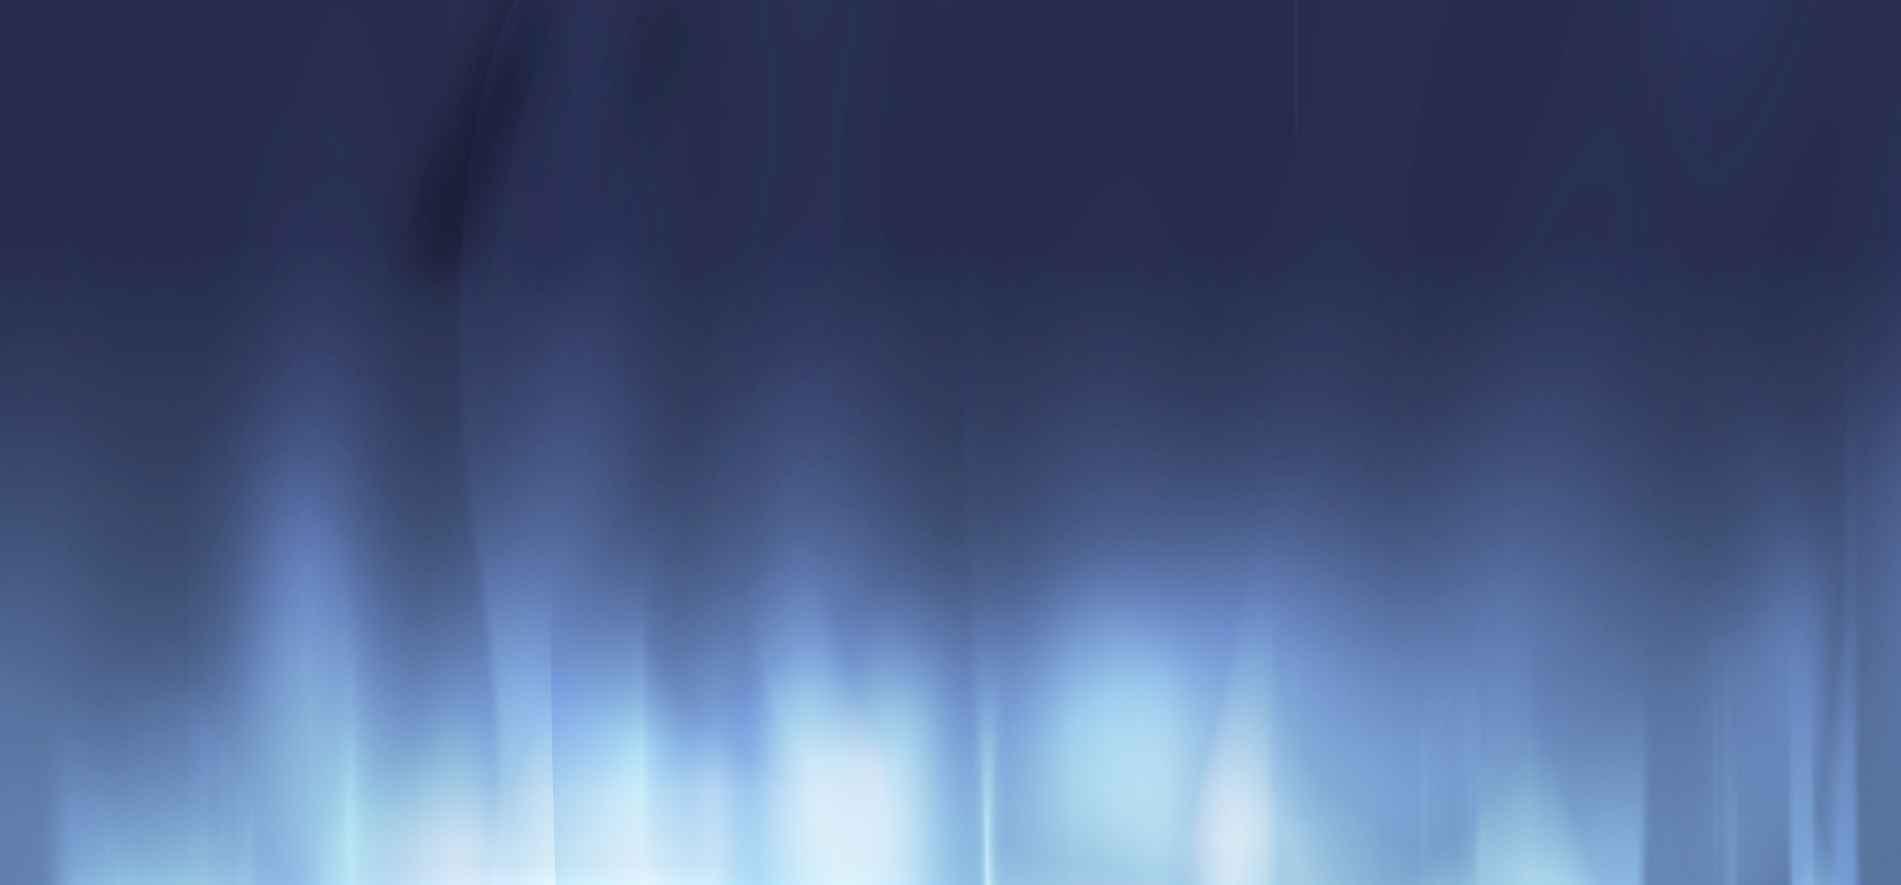 Solid Light Blue Background wallpaper Solid Light Blue Background hd 1901x885